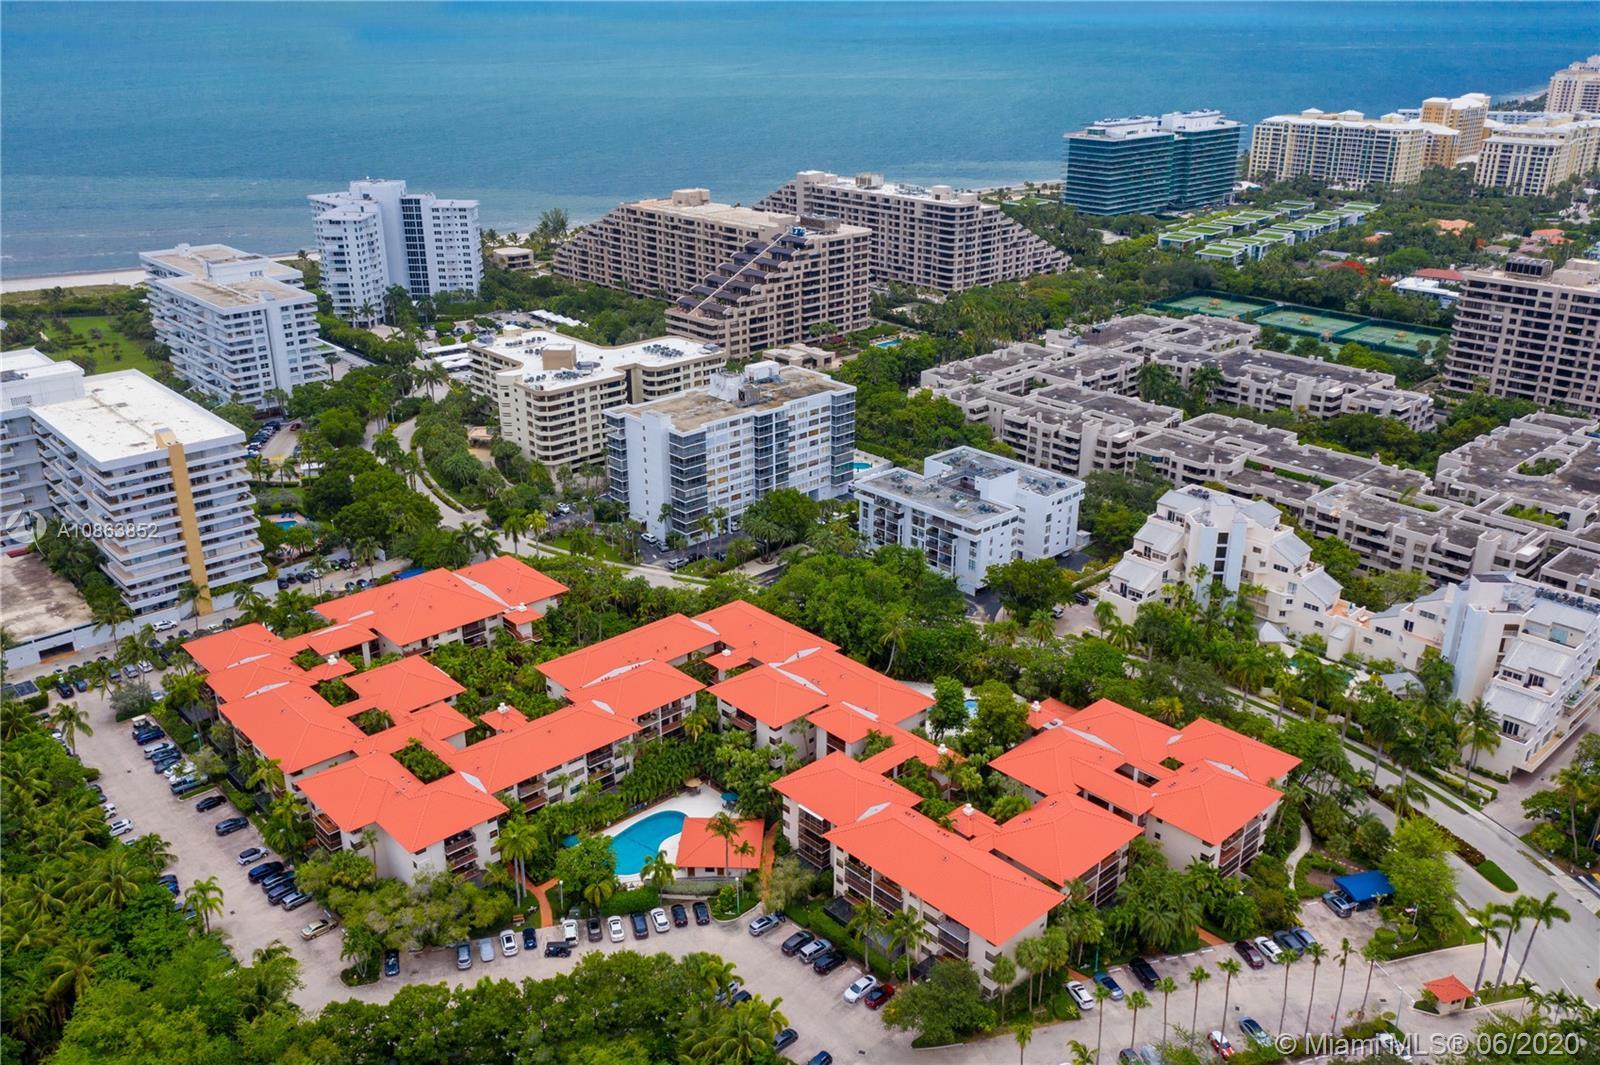 101 Ocean Lane Drive # 3014, Key Biscayne, Florida 33149, 2 Bedrooms Bedrooms, ,2 BathroomsBathrooms,Residential,For Sale,101 Ocean Lane Drive # 3014,A10863852